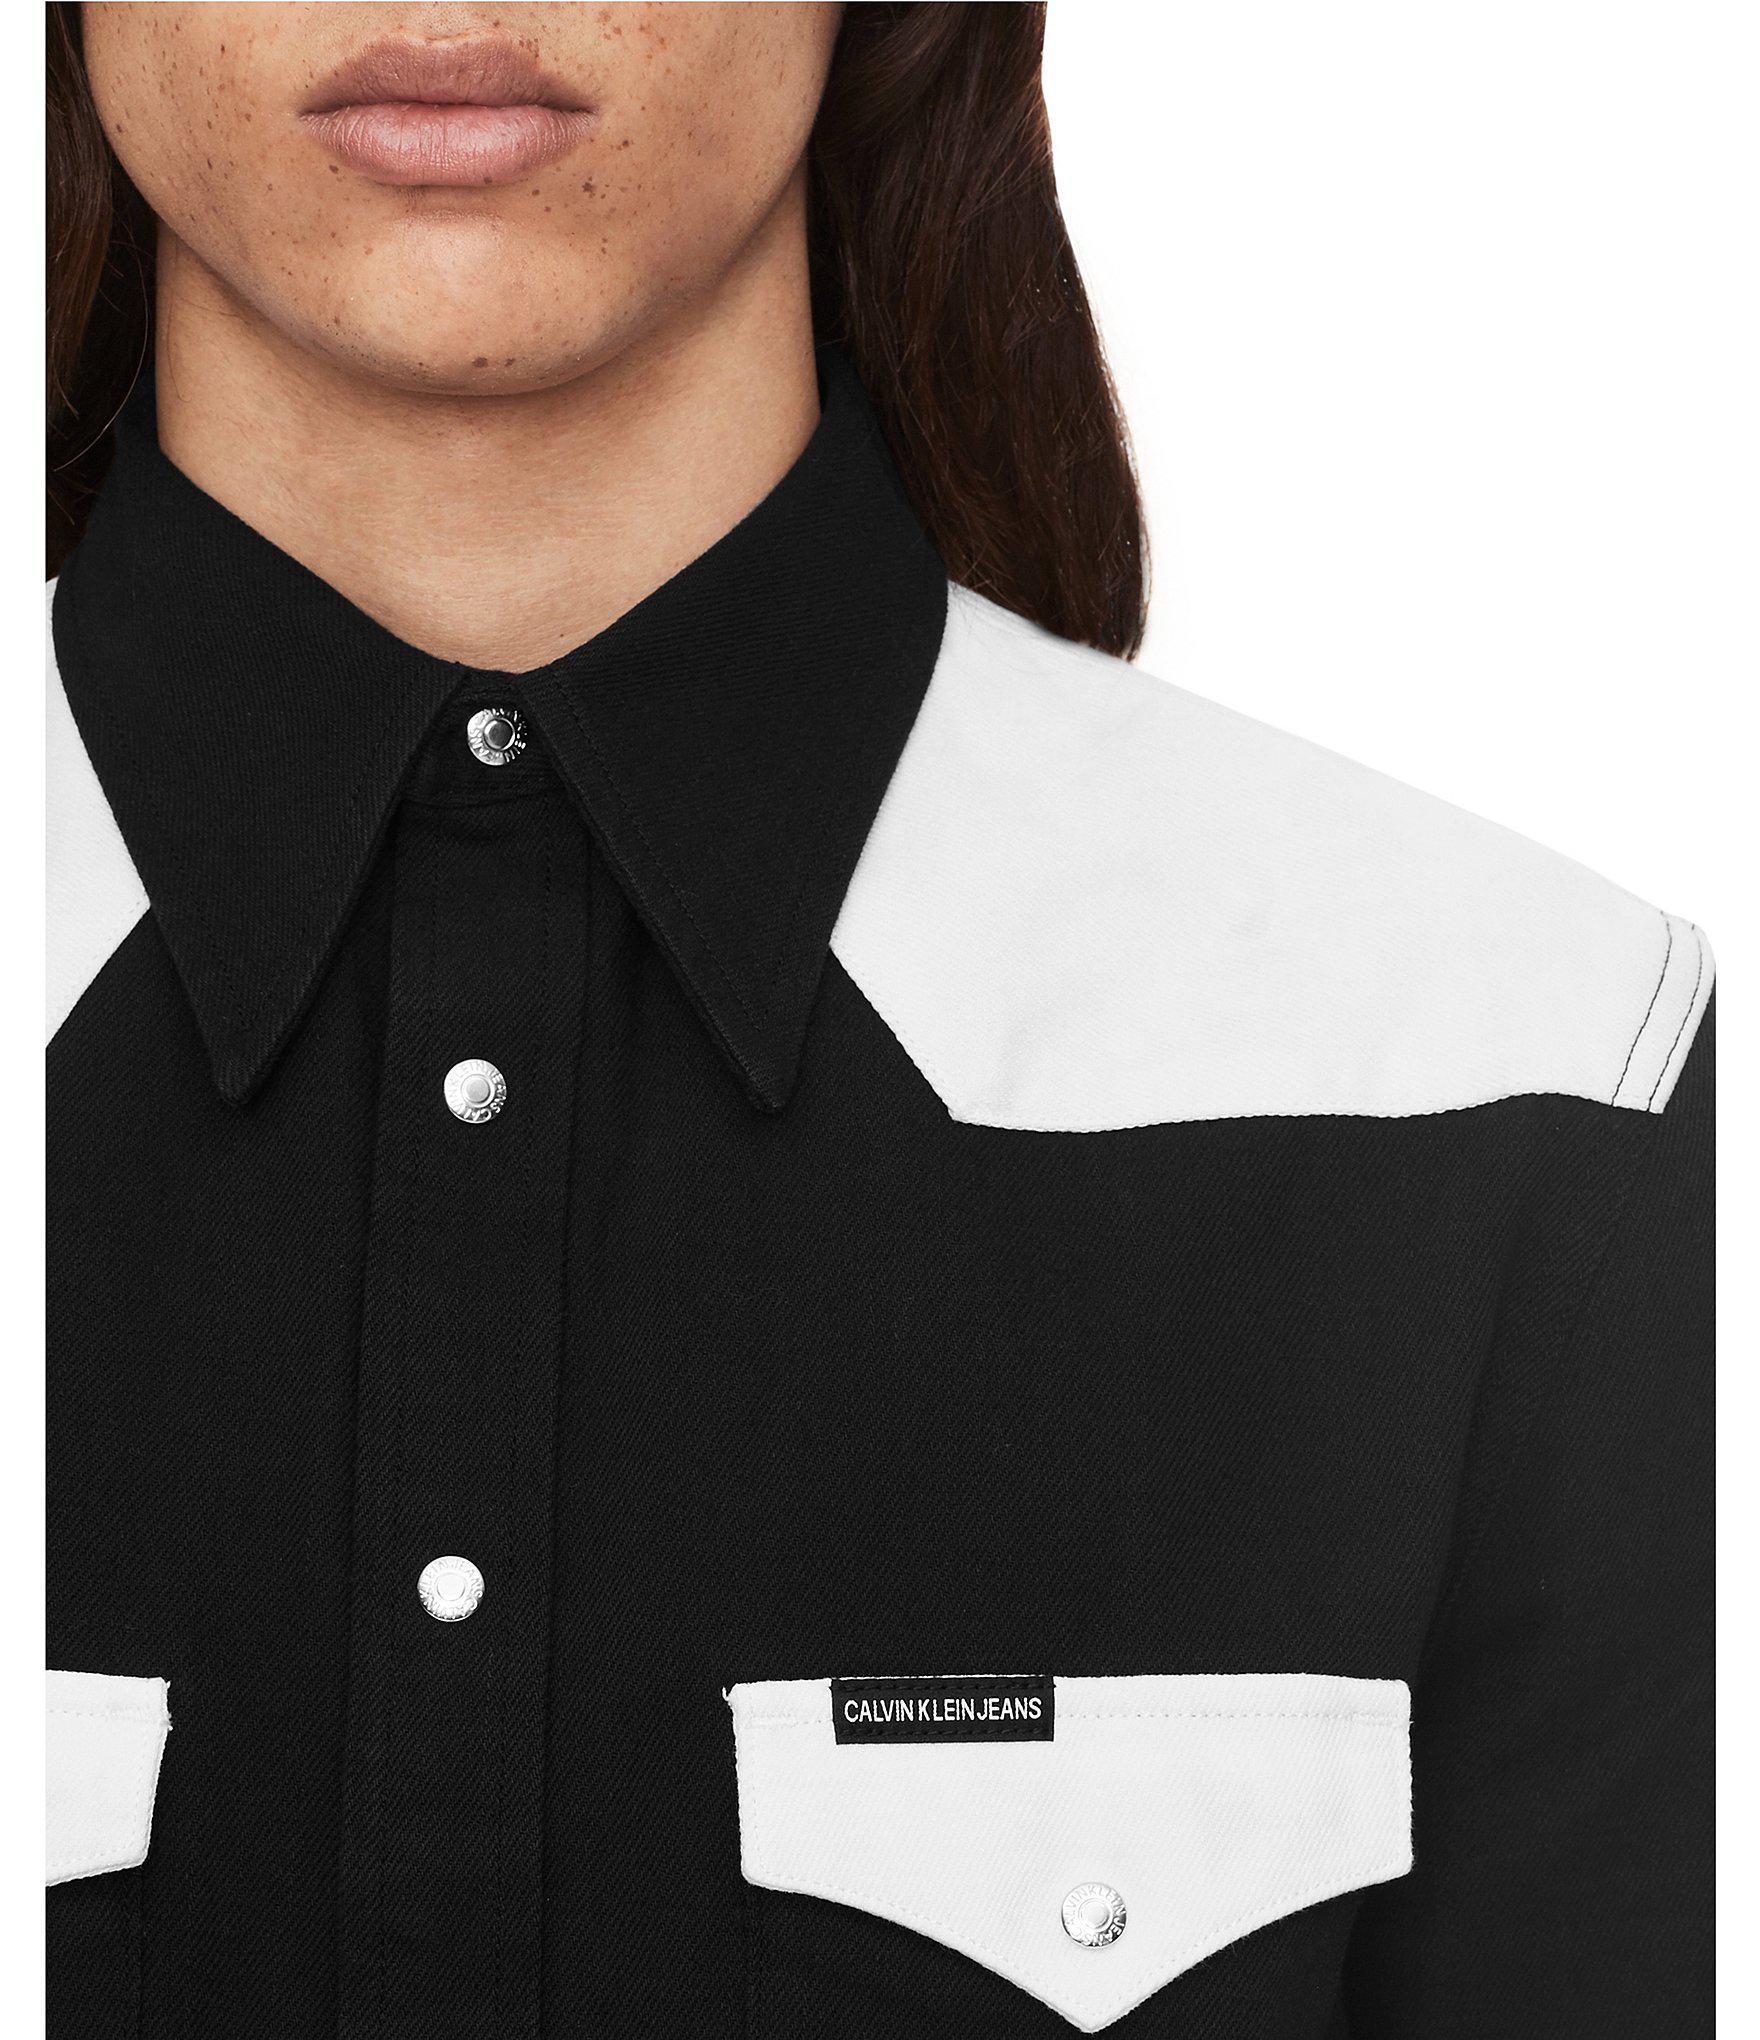 96abb8ff Calvin Klein - Black Jeans Long-sleeve Foundation Western Shirt for Men -  Lyst. View fullscreen